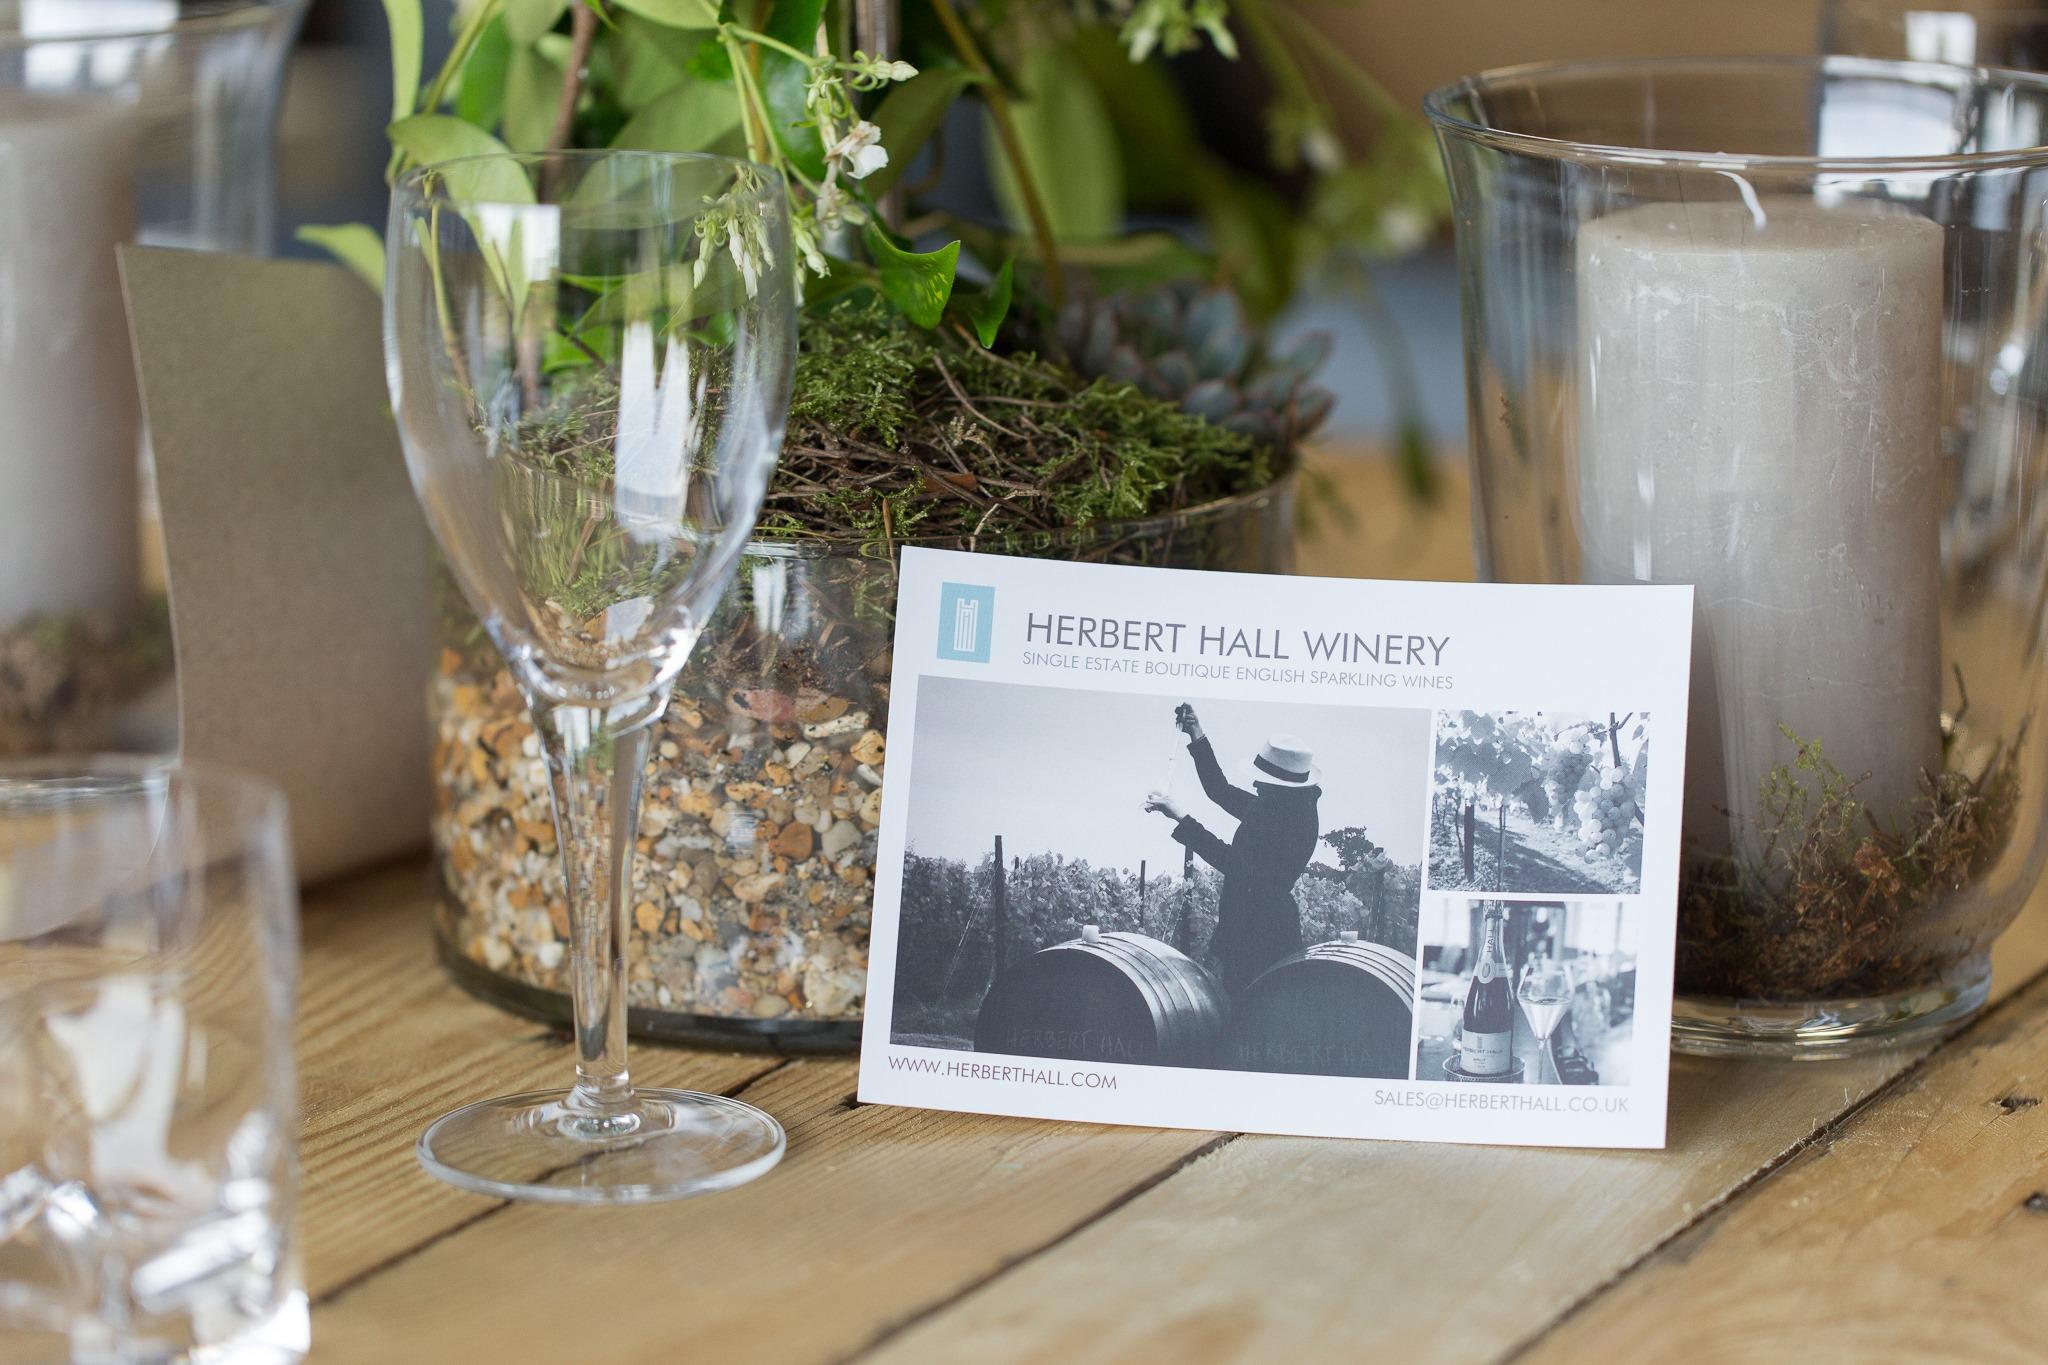 Herbert Hall Winery